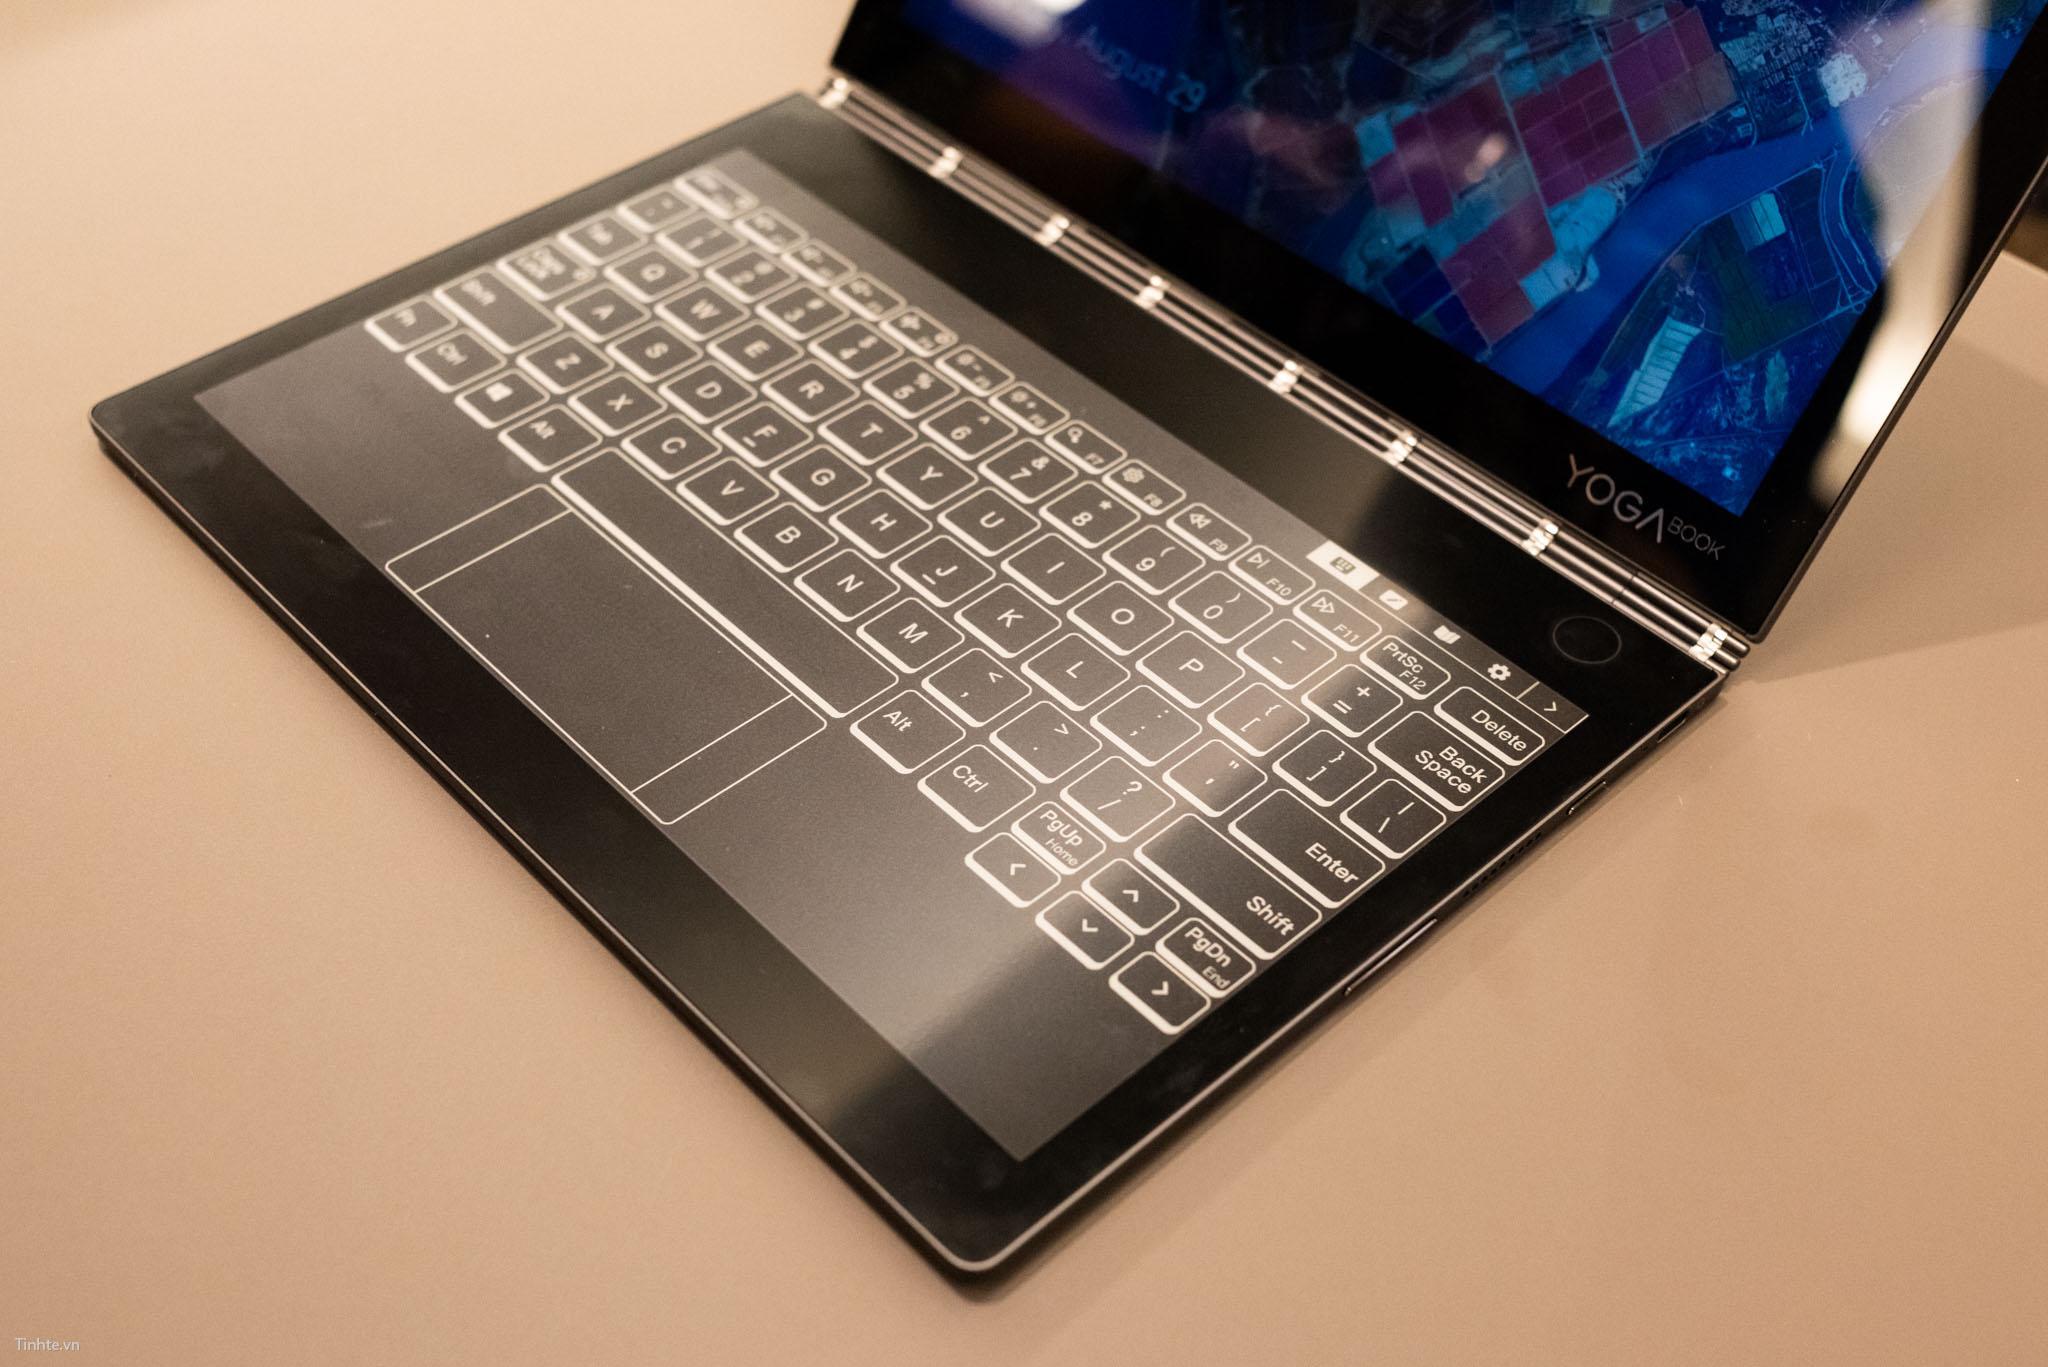 Tinhte.vn_YogaBookC930-4.jpg